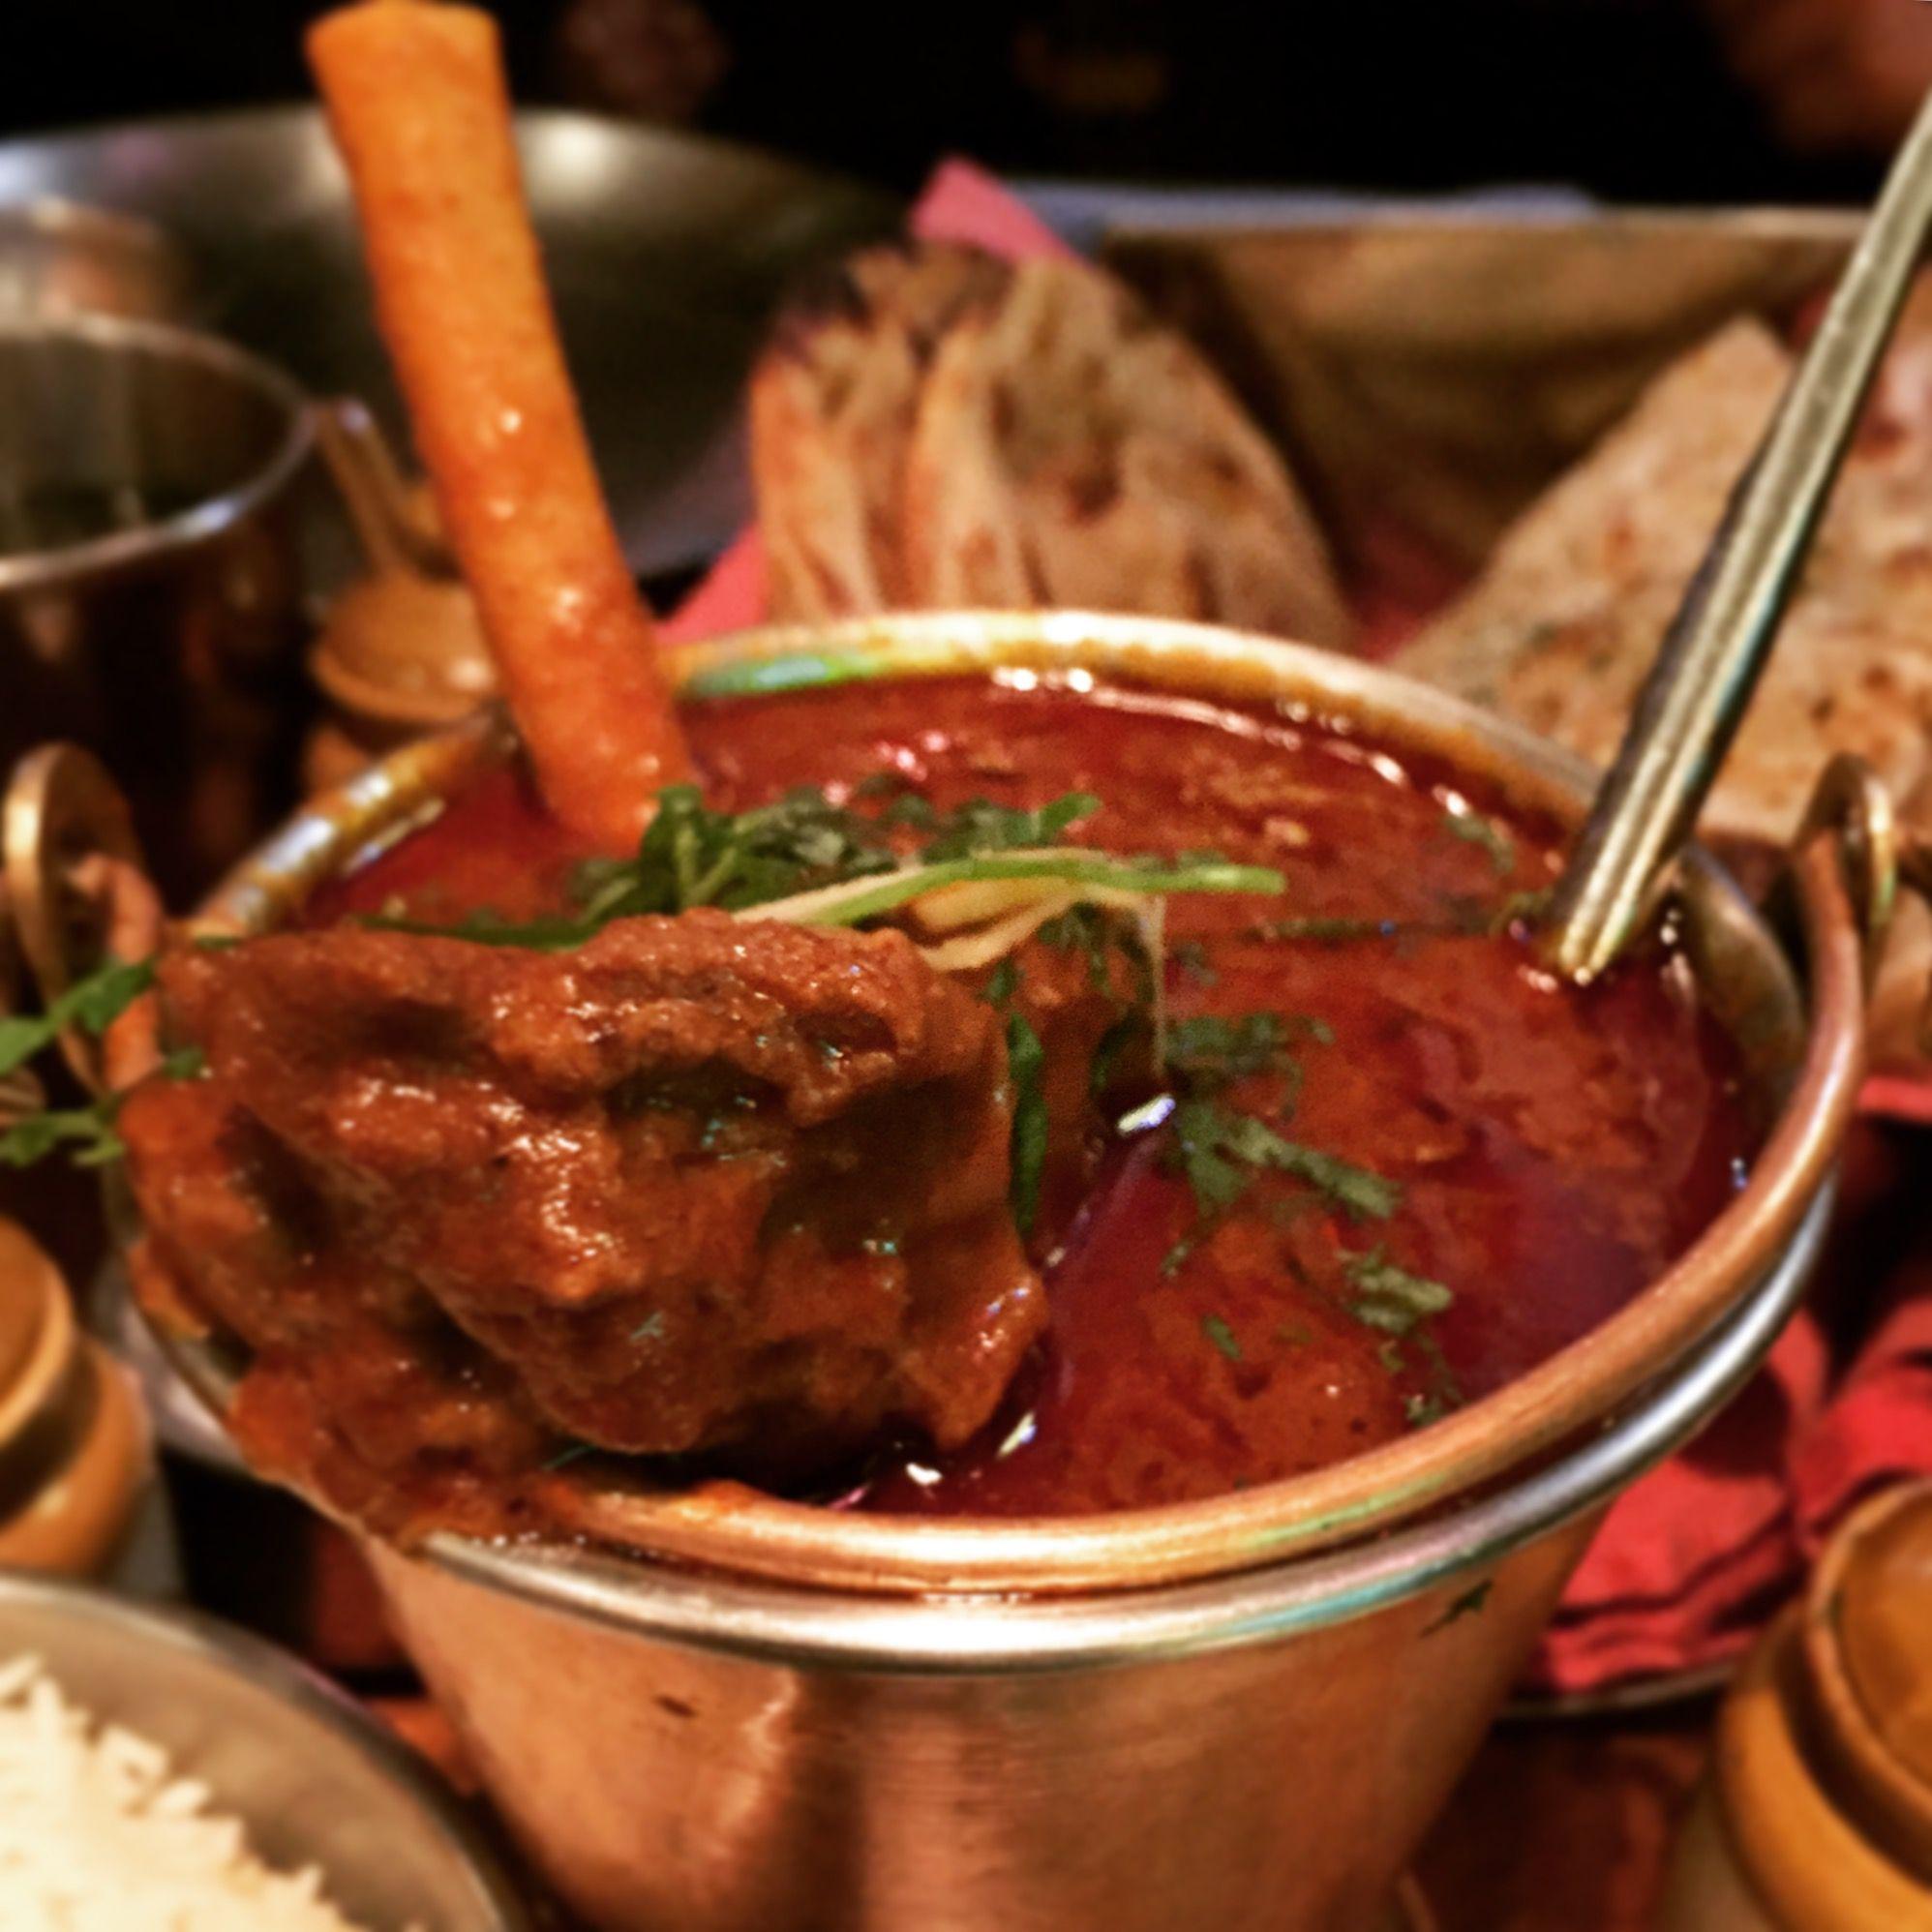 Dhabe ka gosht highway lamb curry curry lambs and curries dhabe ka gosht highway lamb curry forumfinder Choice Image